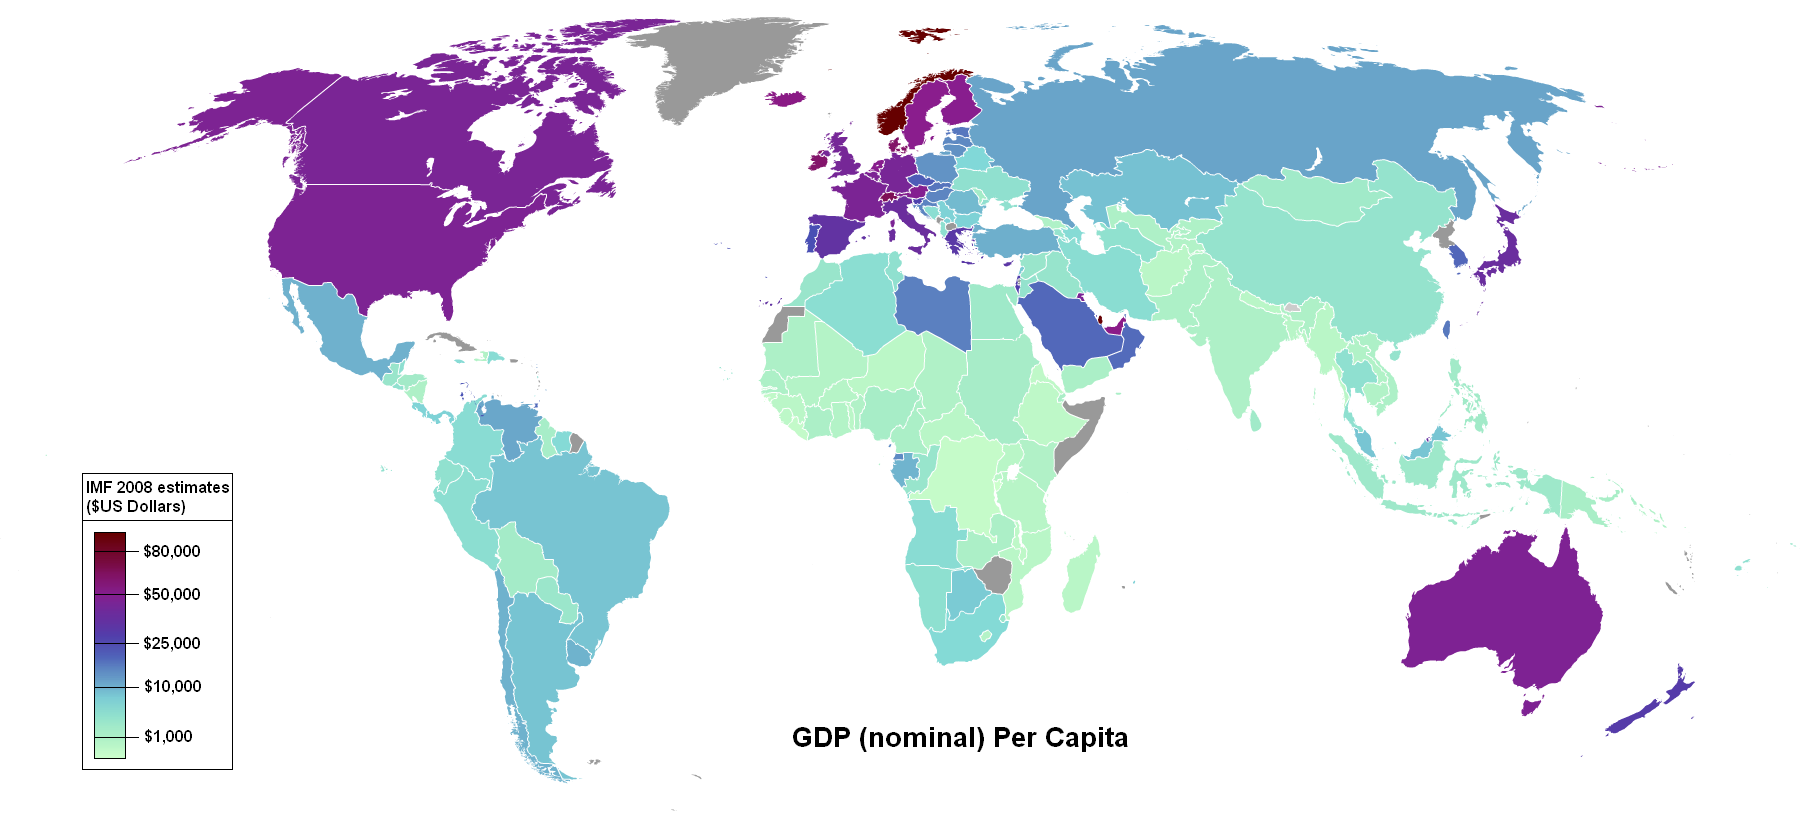 GDP_nominal_per_capita_world_map_IMF_2008